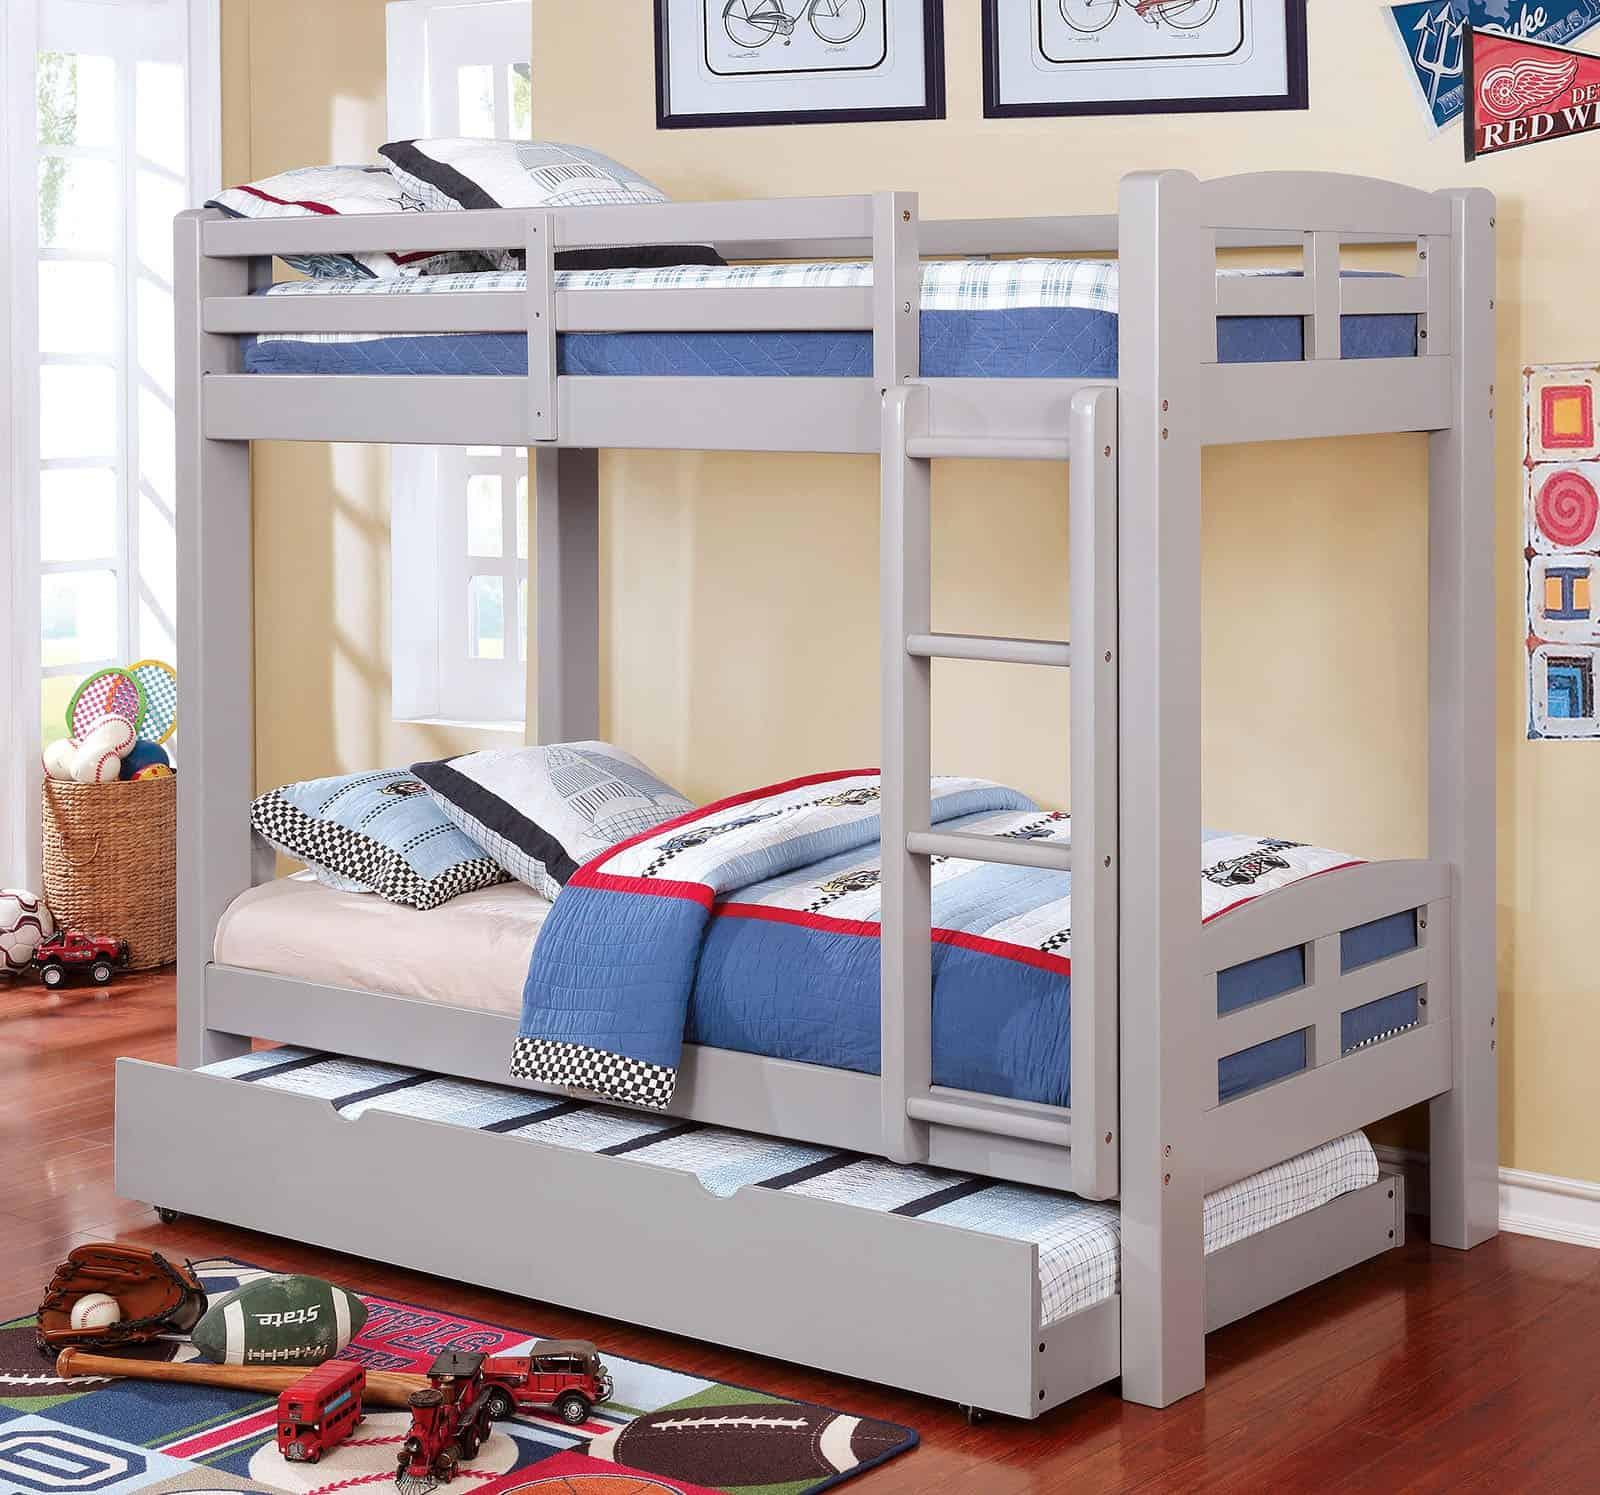 Affordable Home Furnishings: Affordable Home Furniture